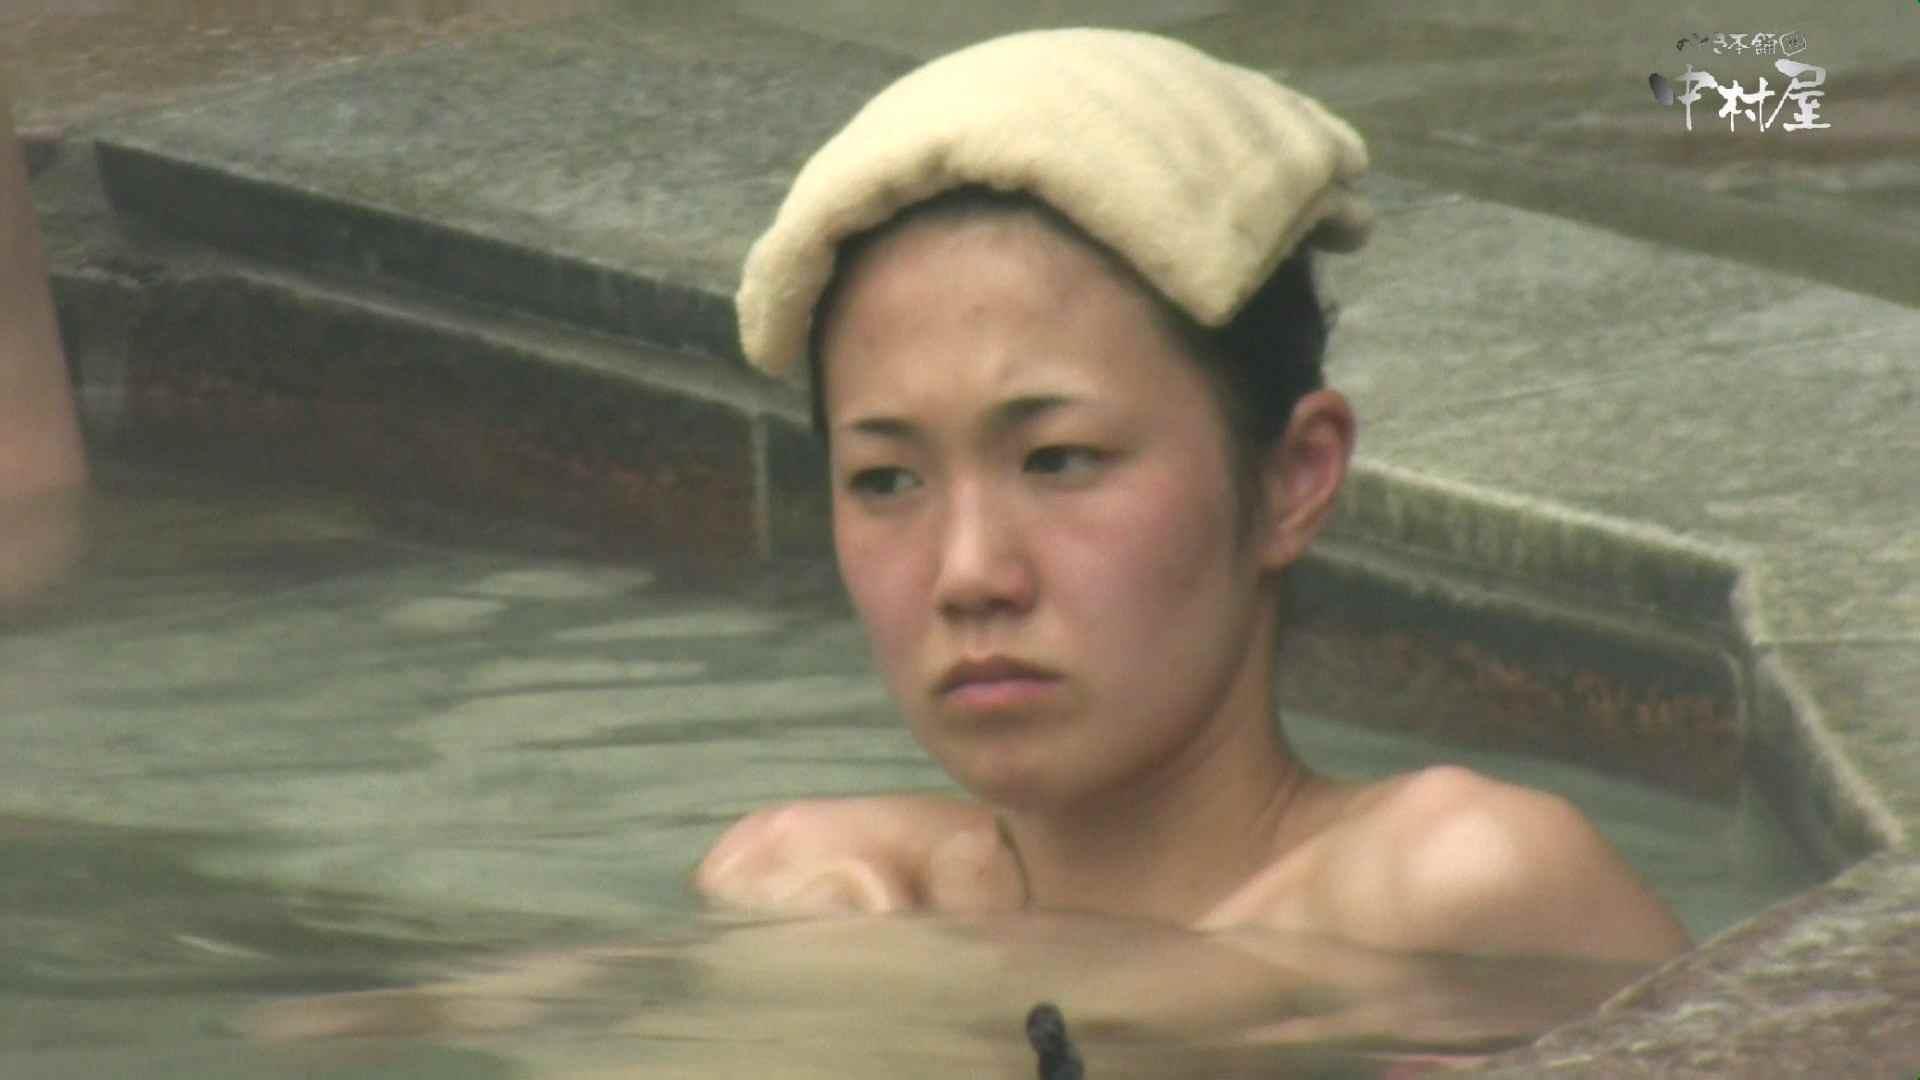 Aquaな露天風呂Vol.889 0  87連発 54